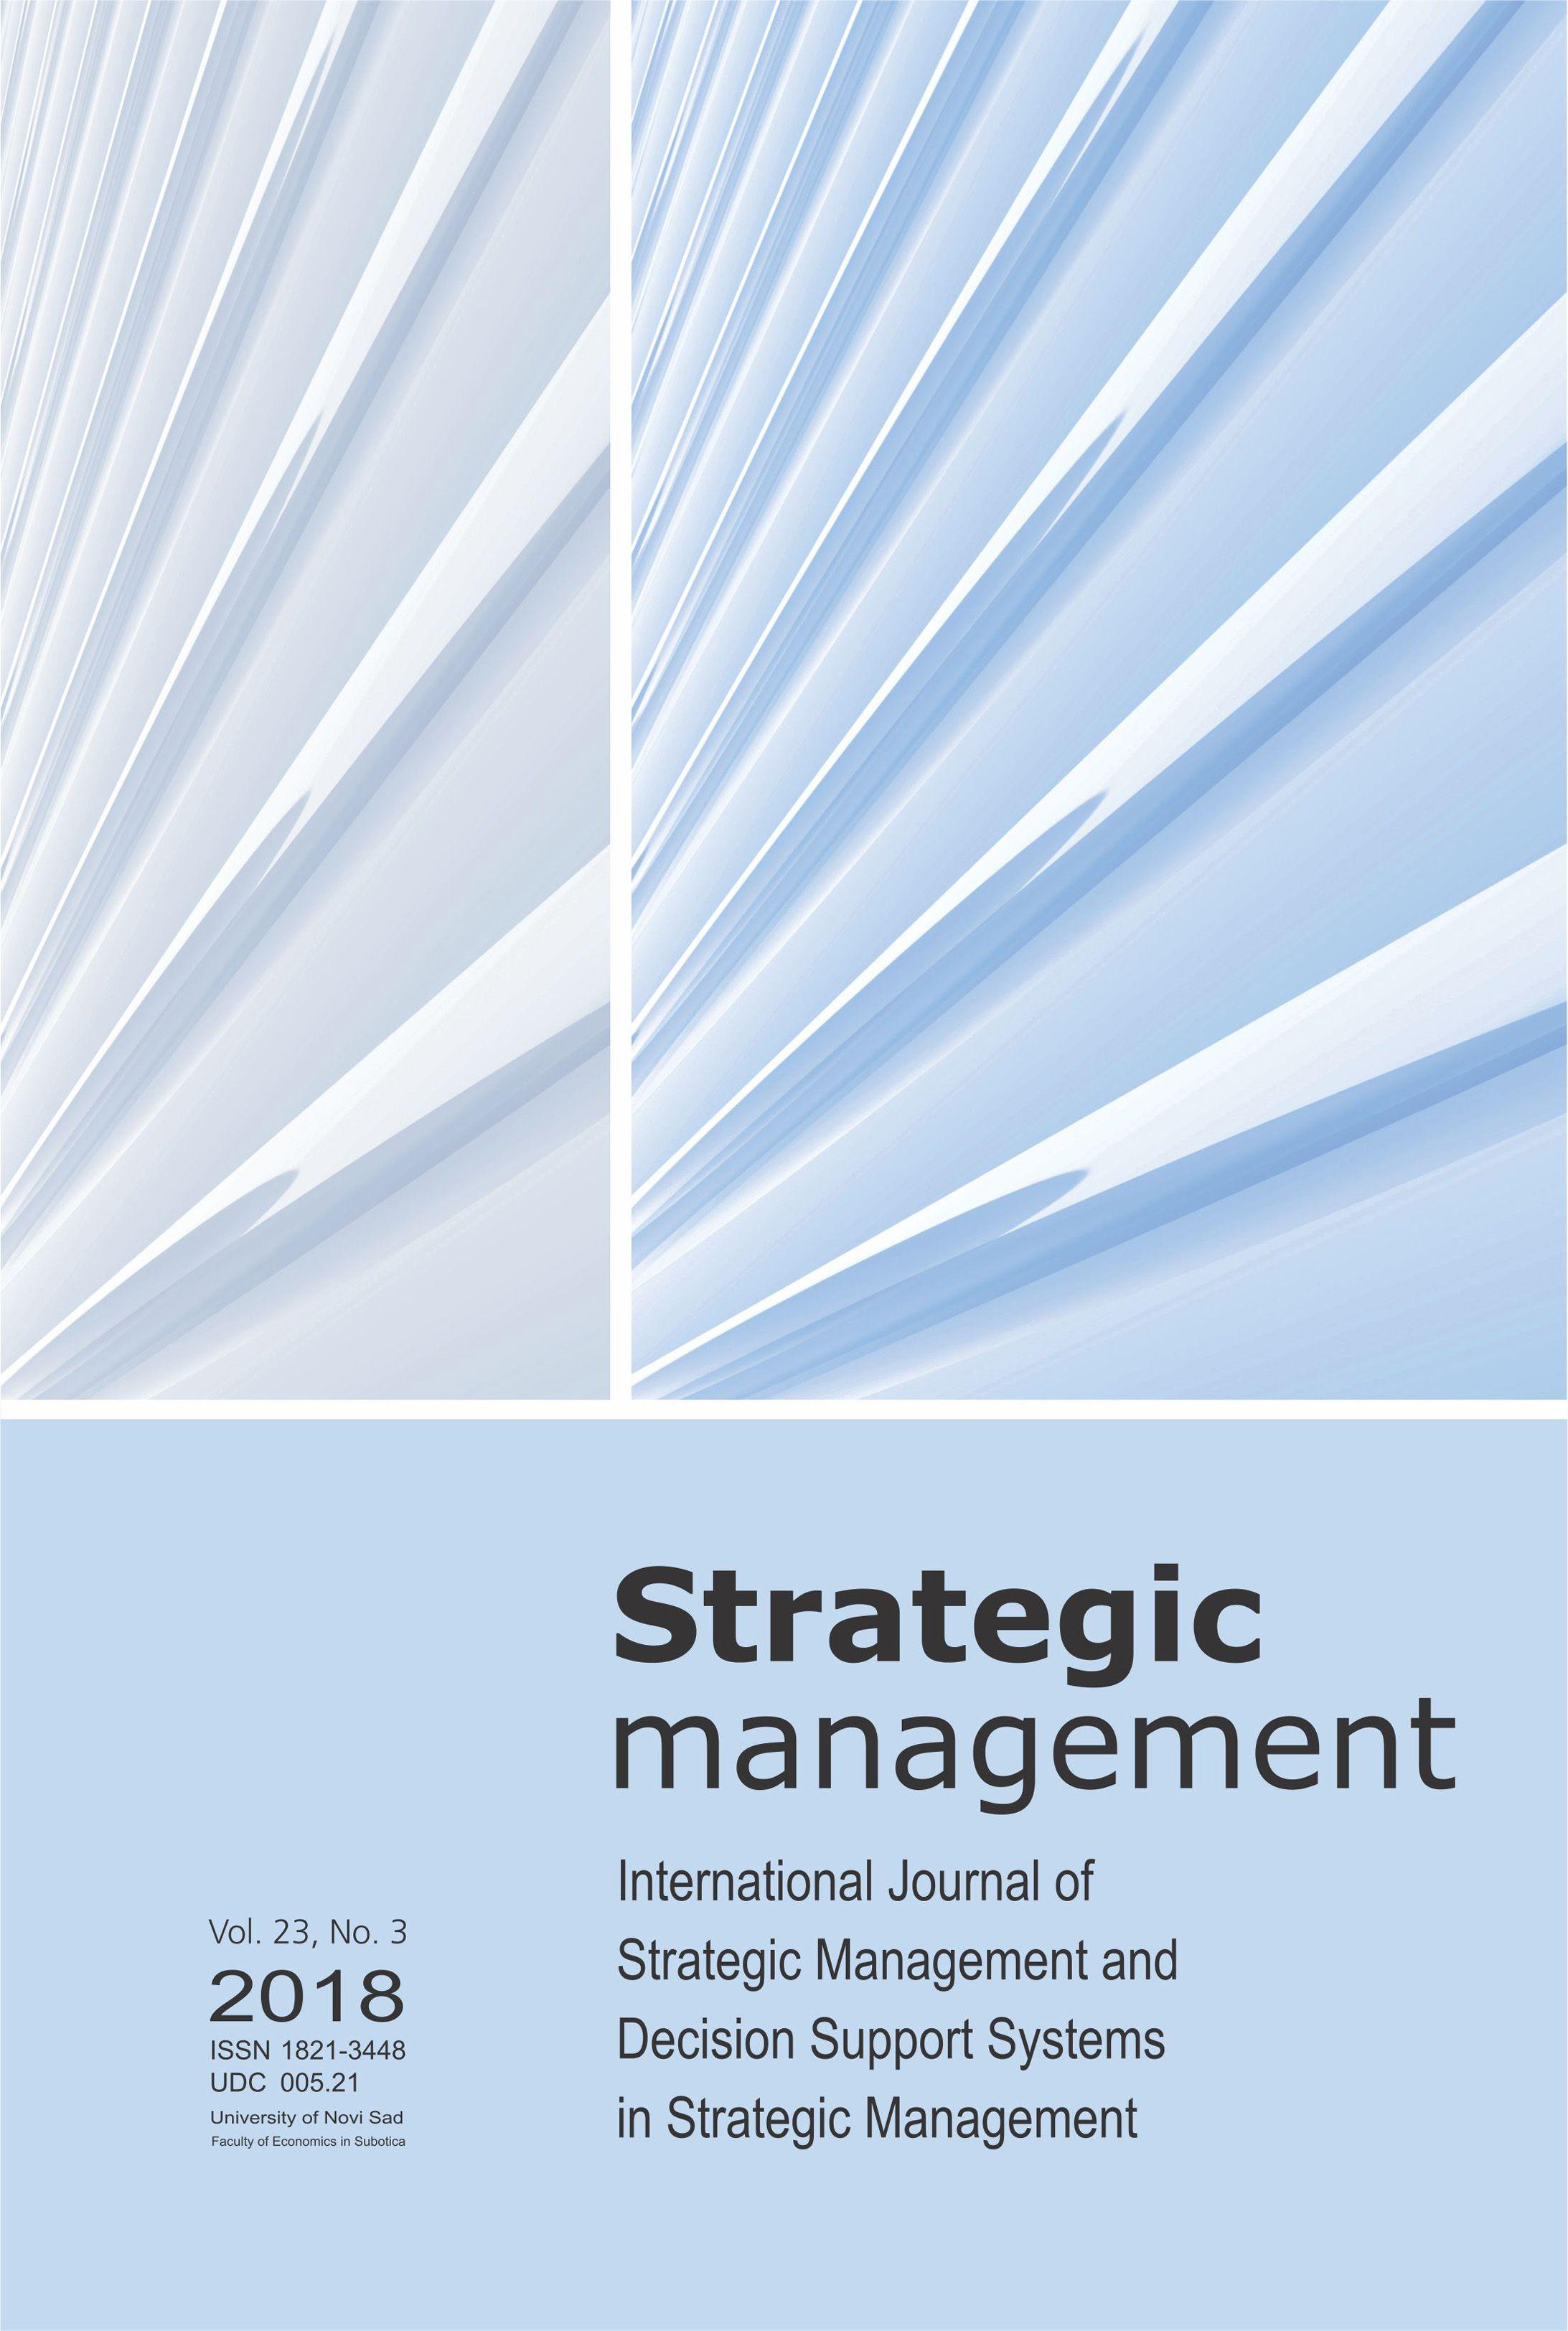 View Vol. 23 No. 3 (2018): Strategic Management